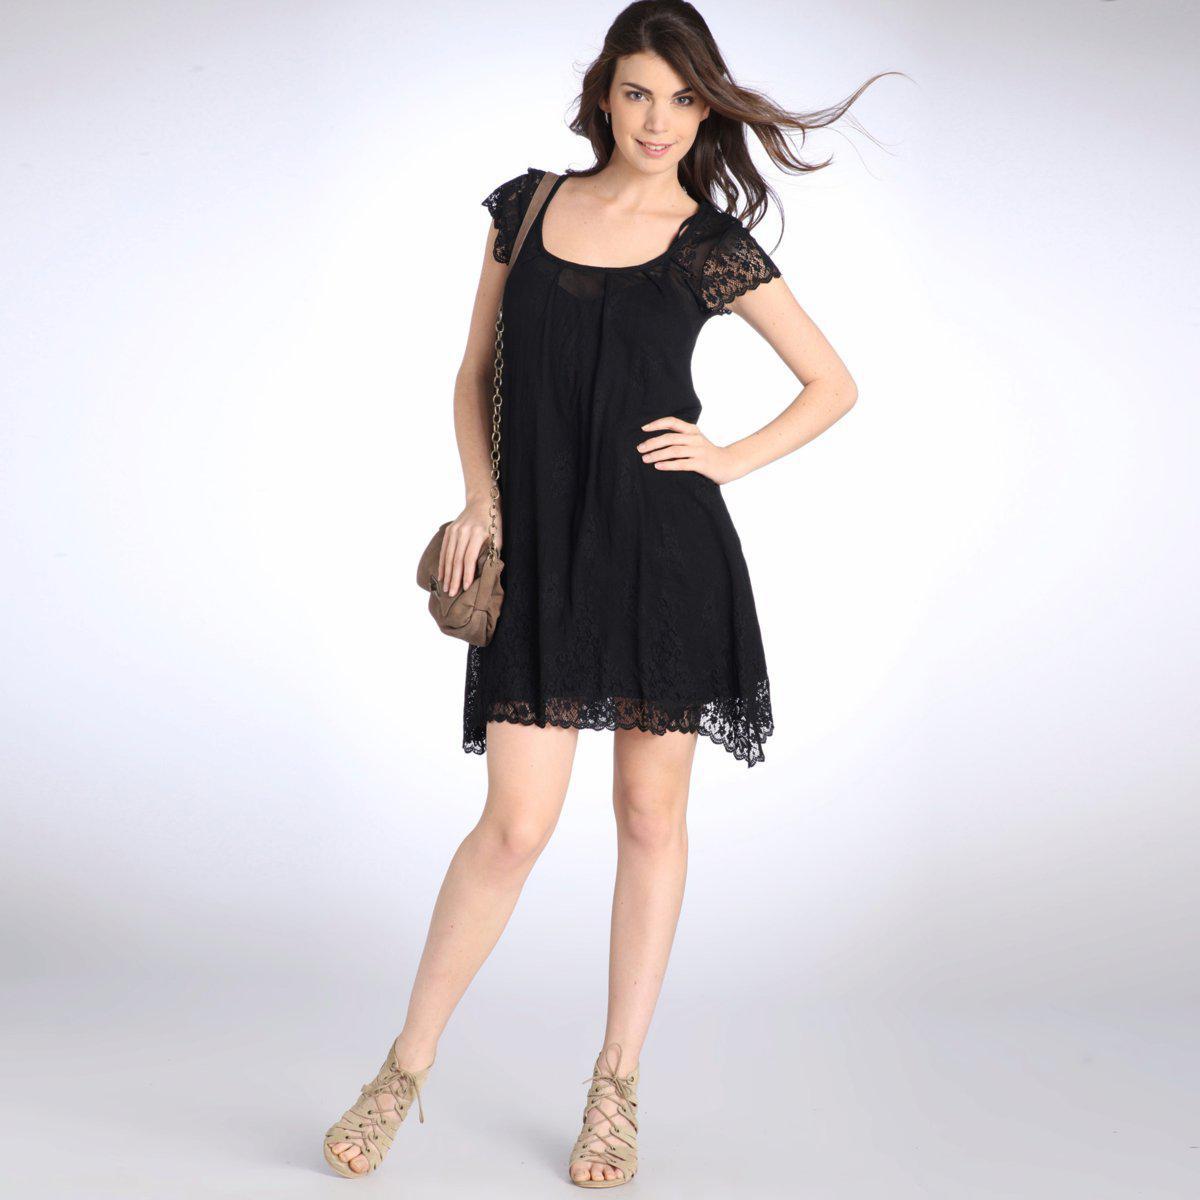 1036c4cfd4d0 Βραδυνα Φορεματα La Redoute Φθινόπωρο Χειμώνας 2011 κωδ. 324212422